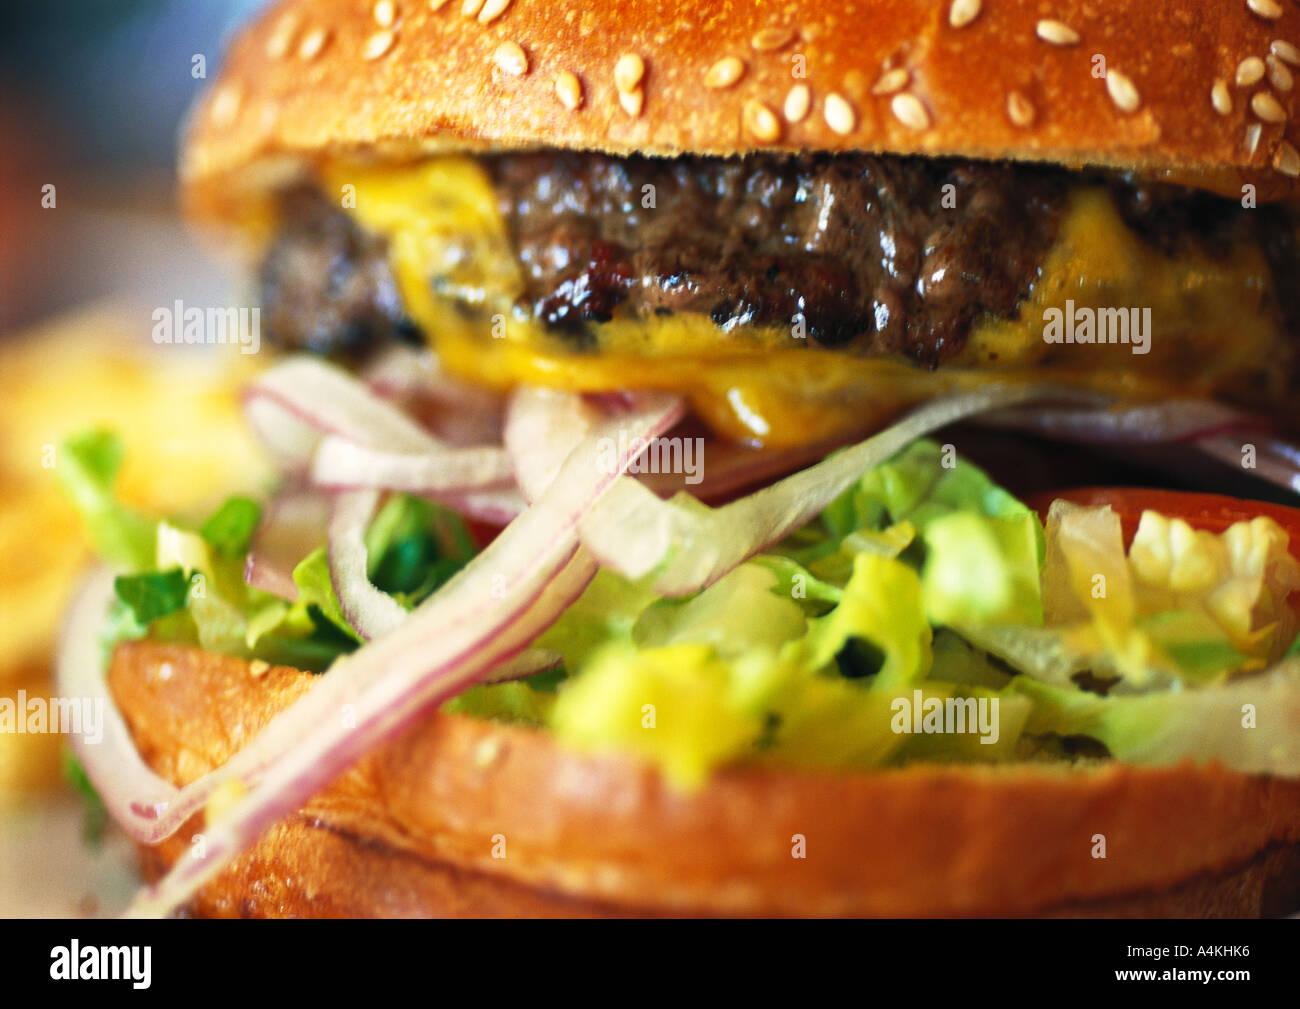 Cheeseburger - Stock Image